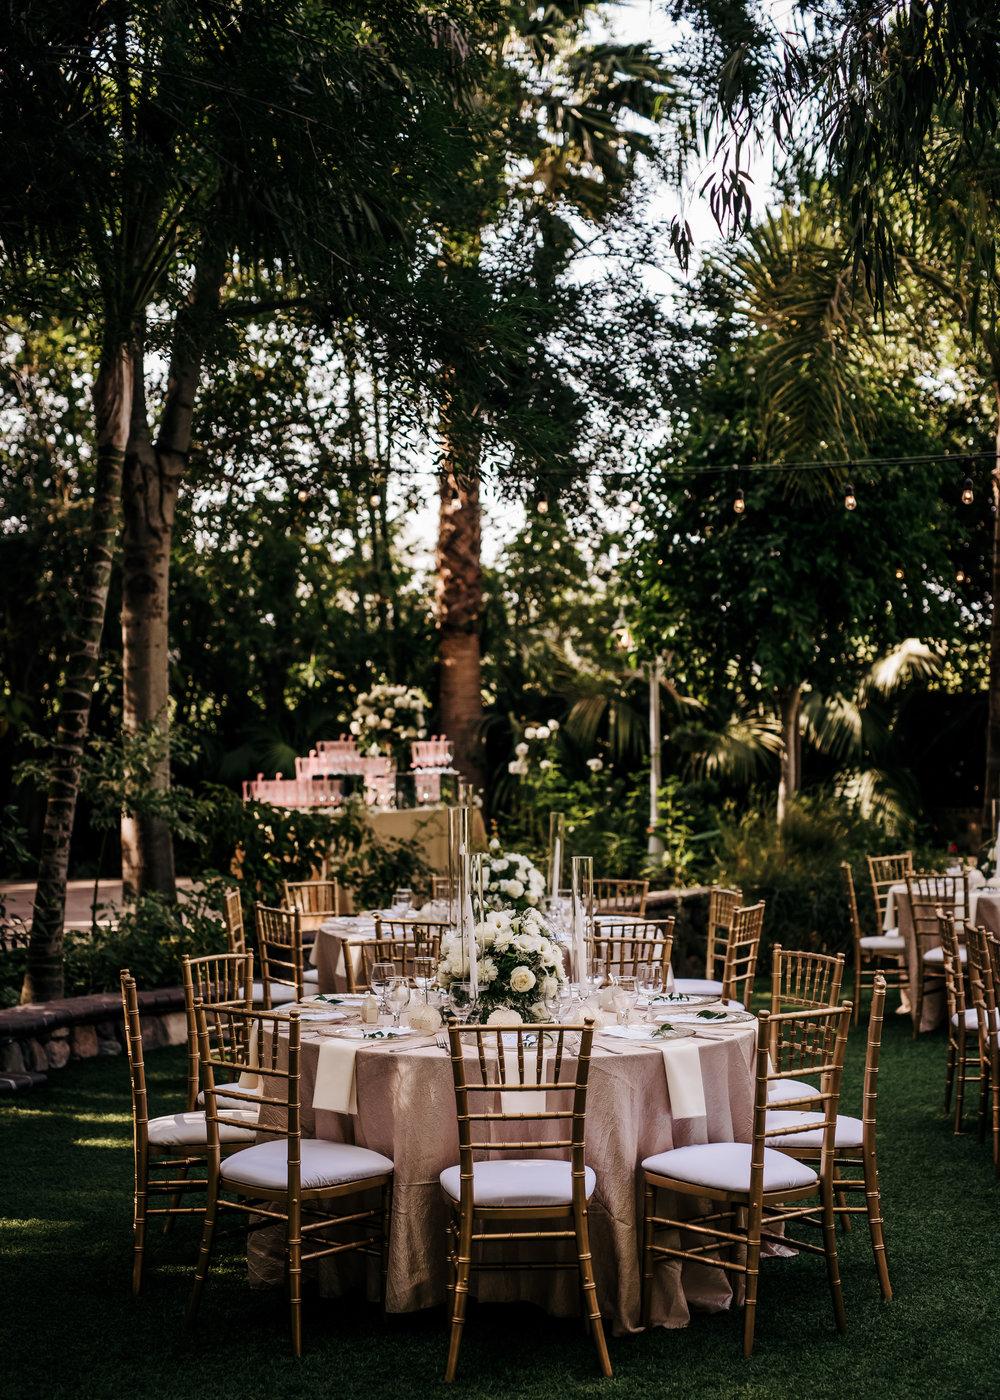 Turchin_20180825_Austinae-Brent-Wedding_408.jpg